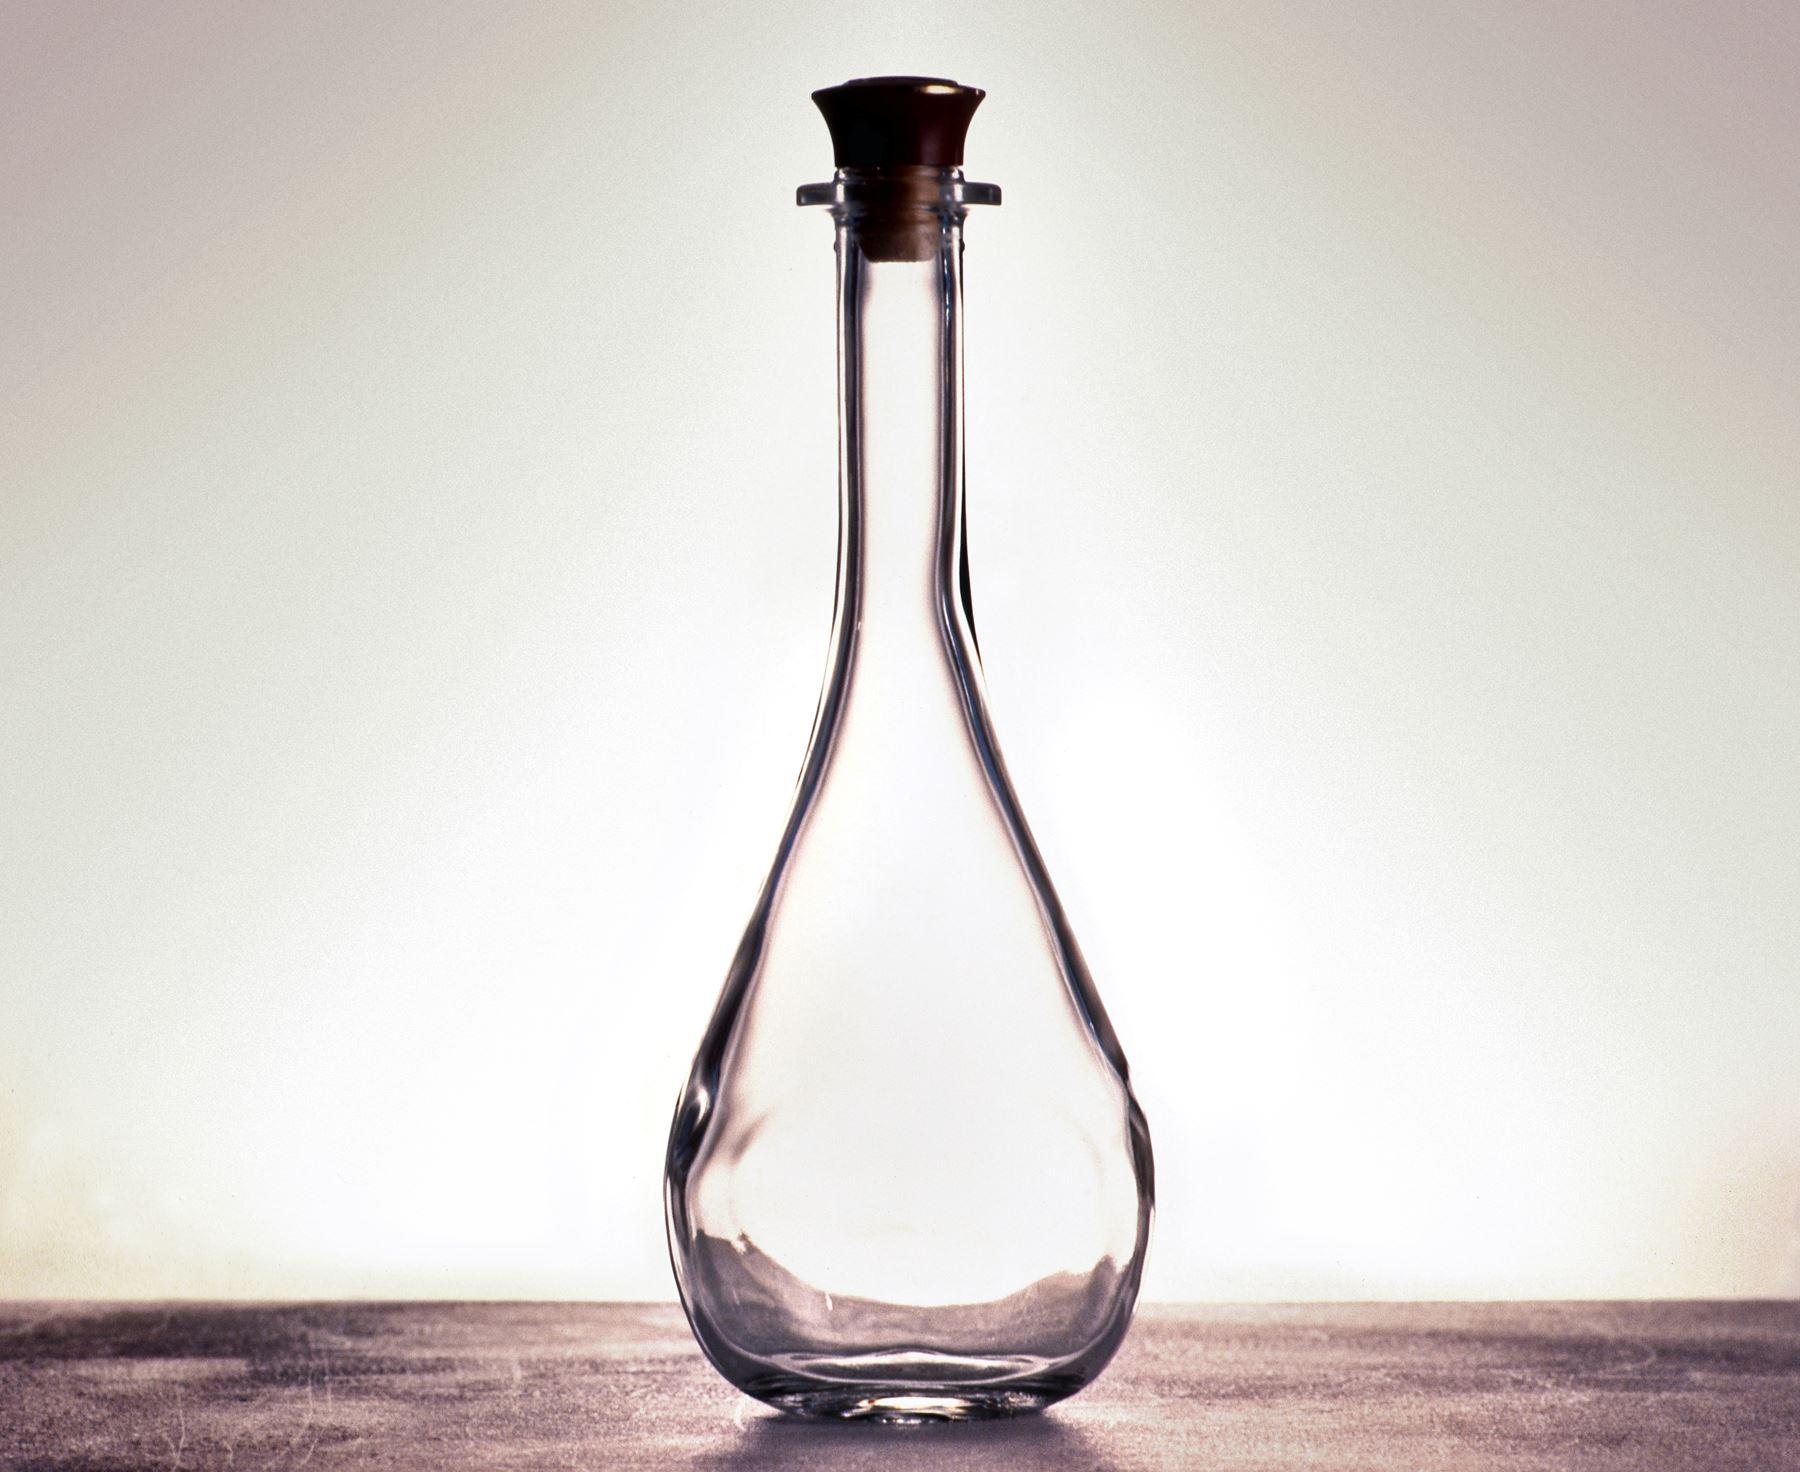 Backlit glass photography